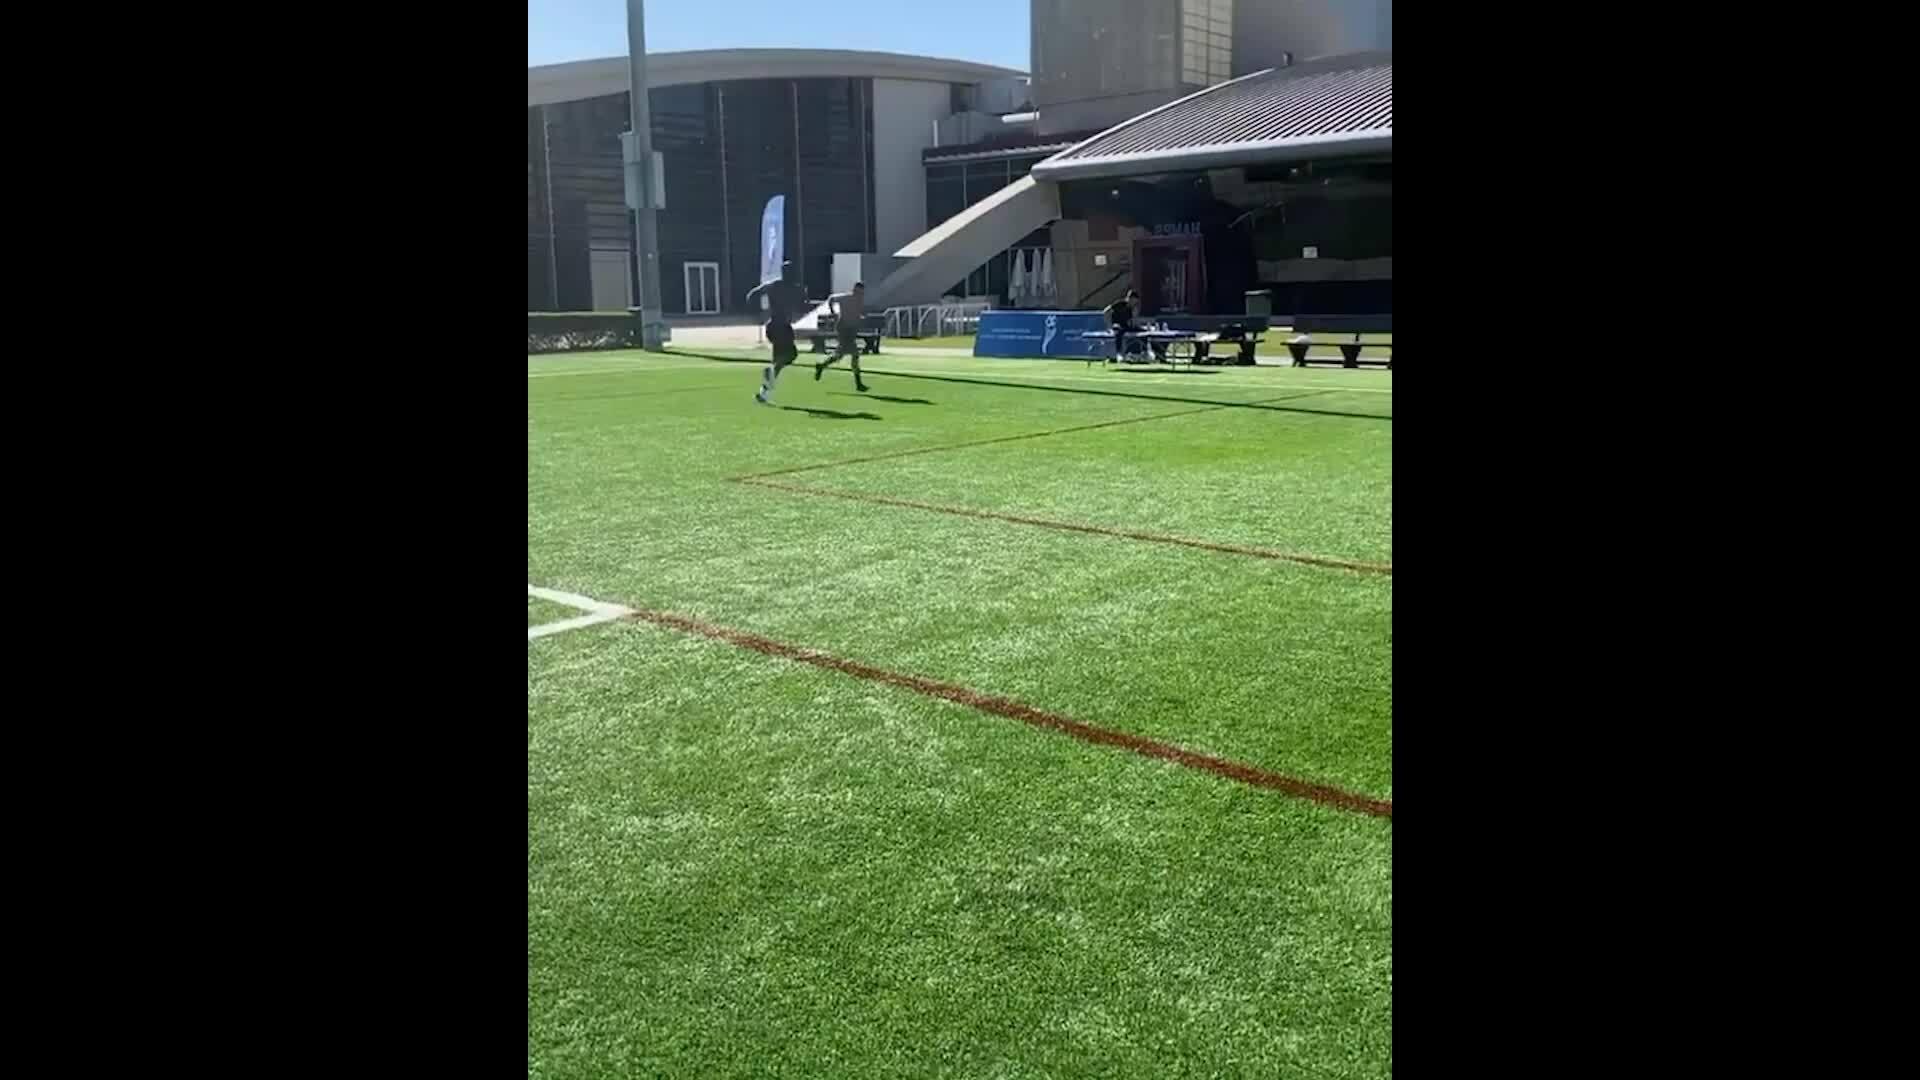 Lukaku rẻn luyện kỹ năng